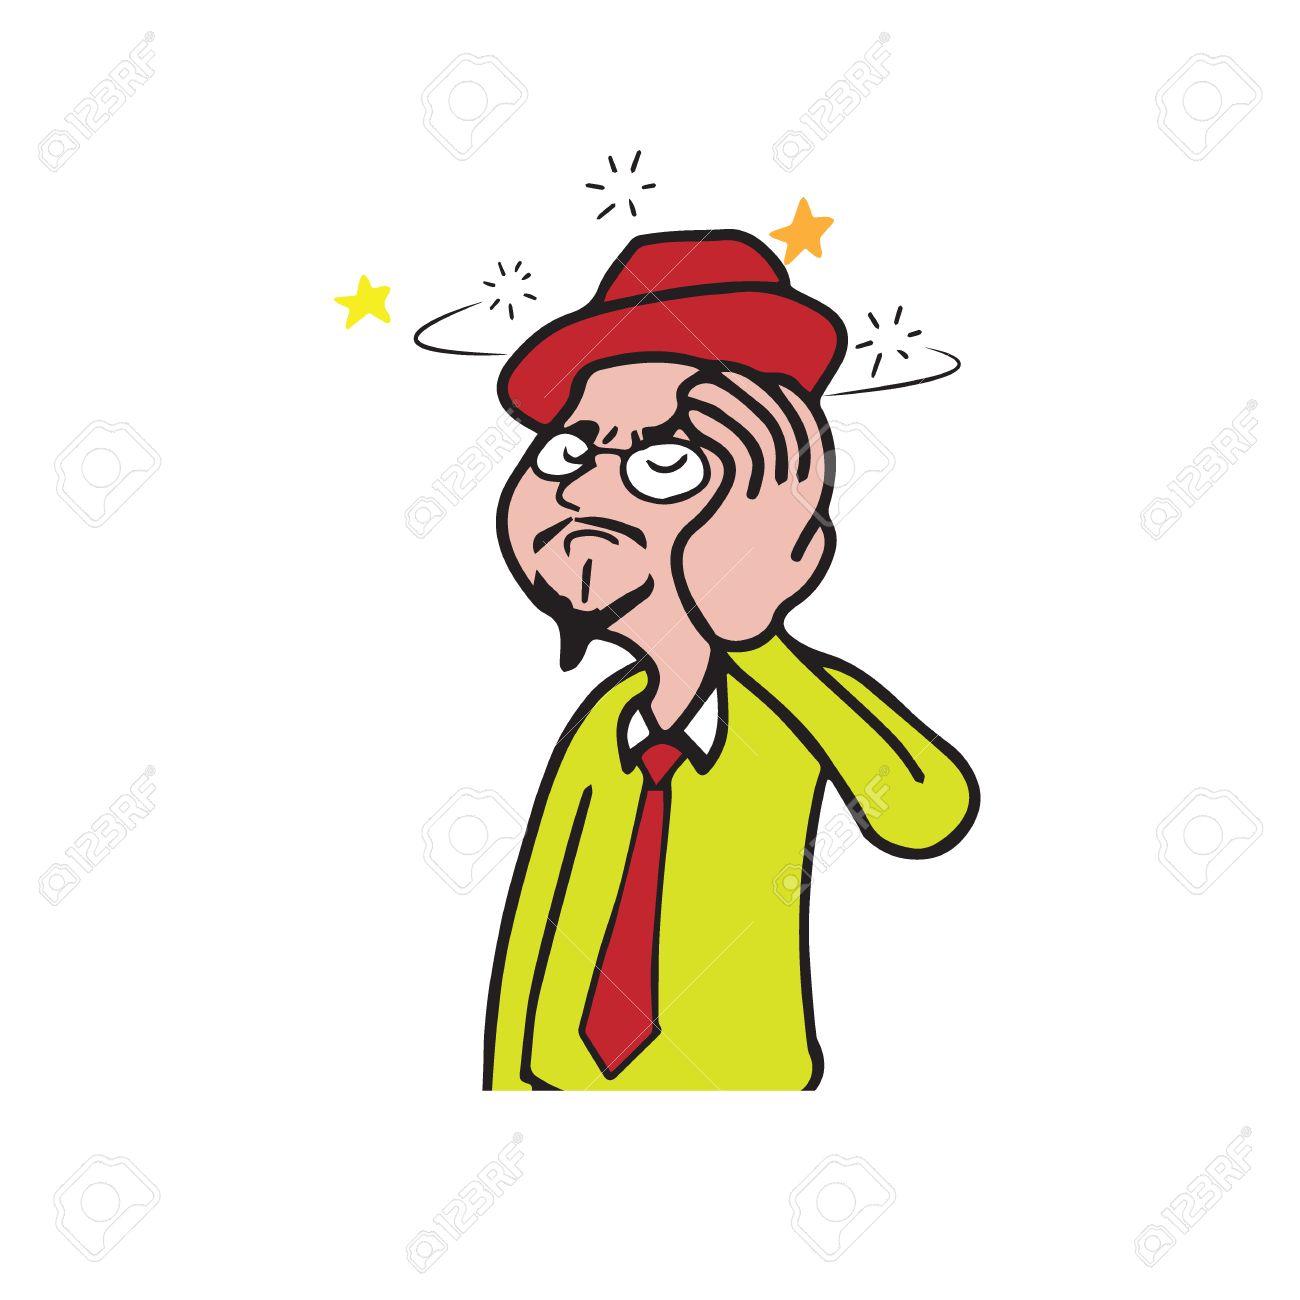 1300x1300 Health Man Colorful Dress Dizzy Cartoon Drawing Royalty Free